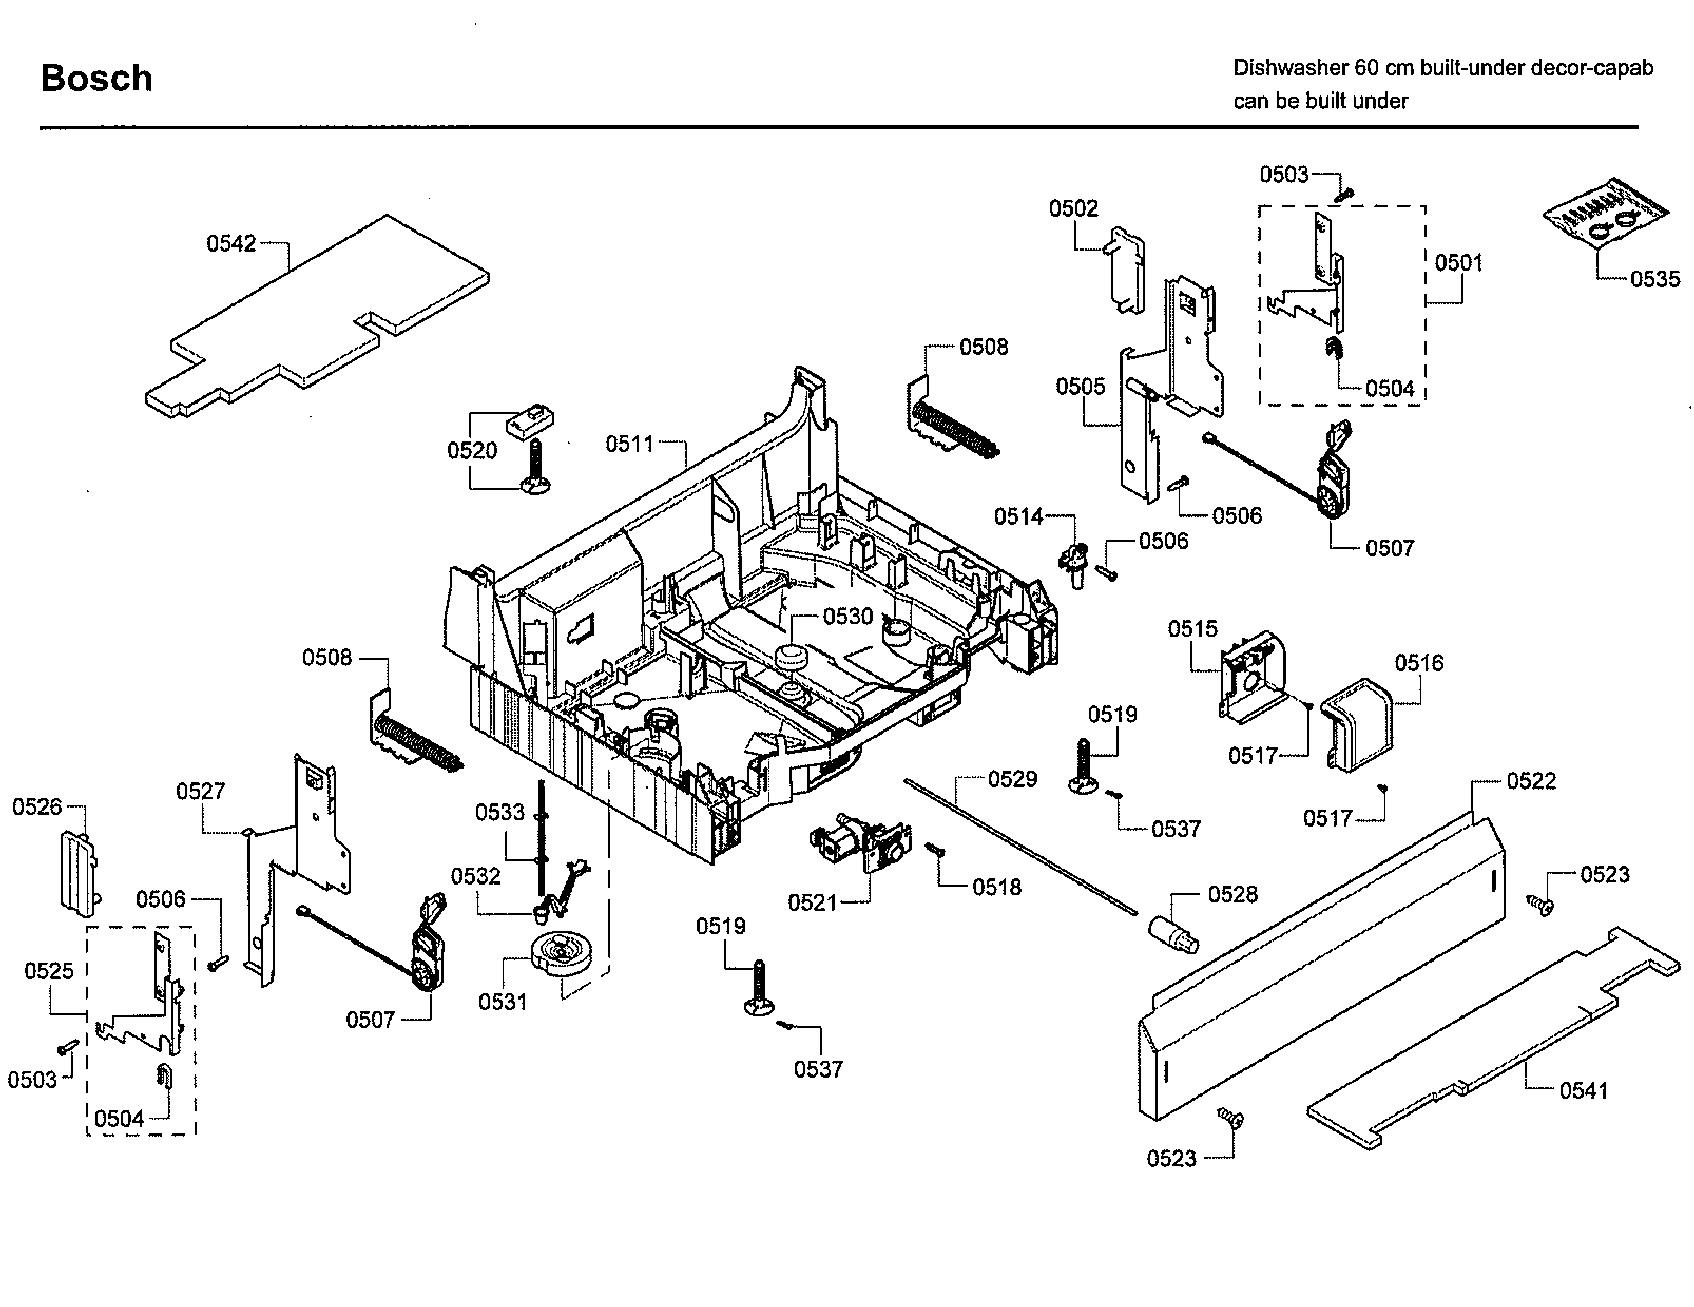 hight resolution of bosch she43rl5uc 64 base diagram